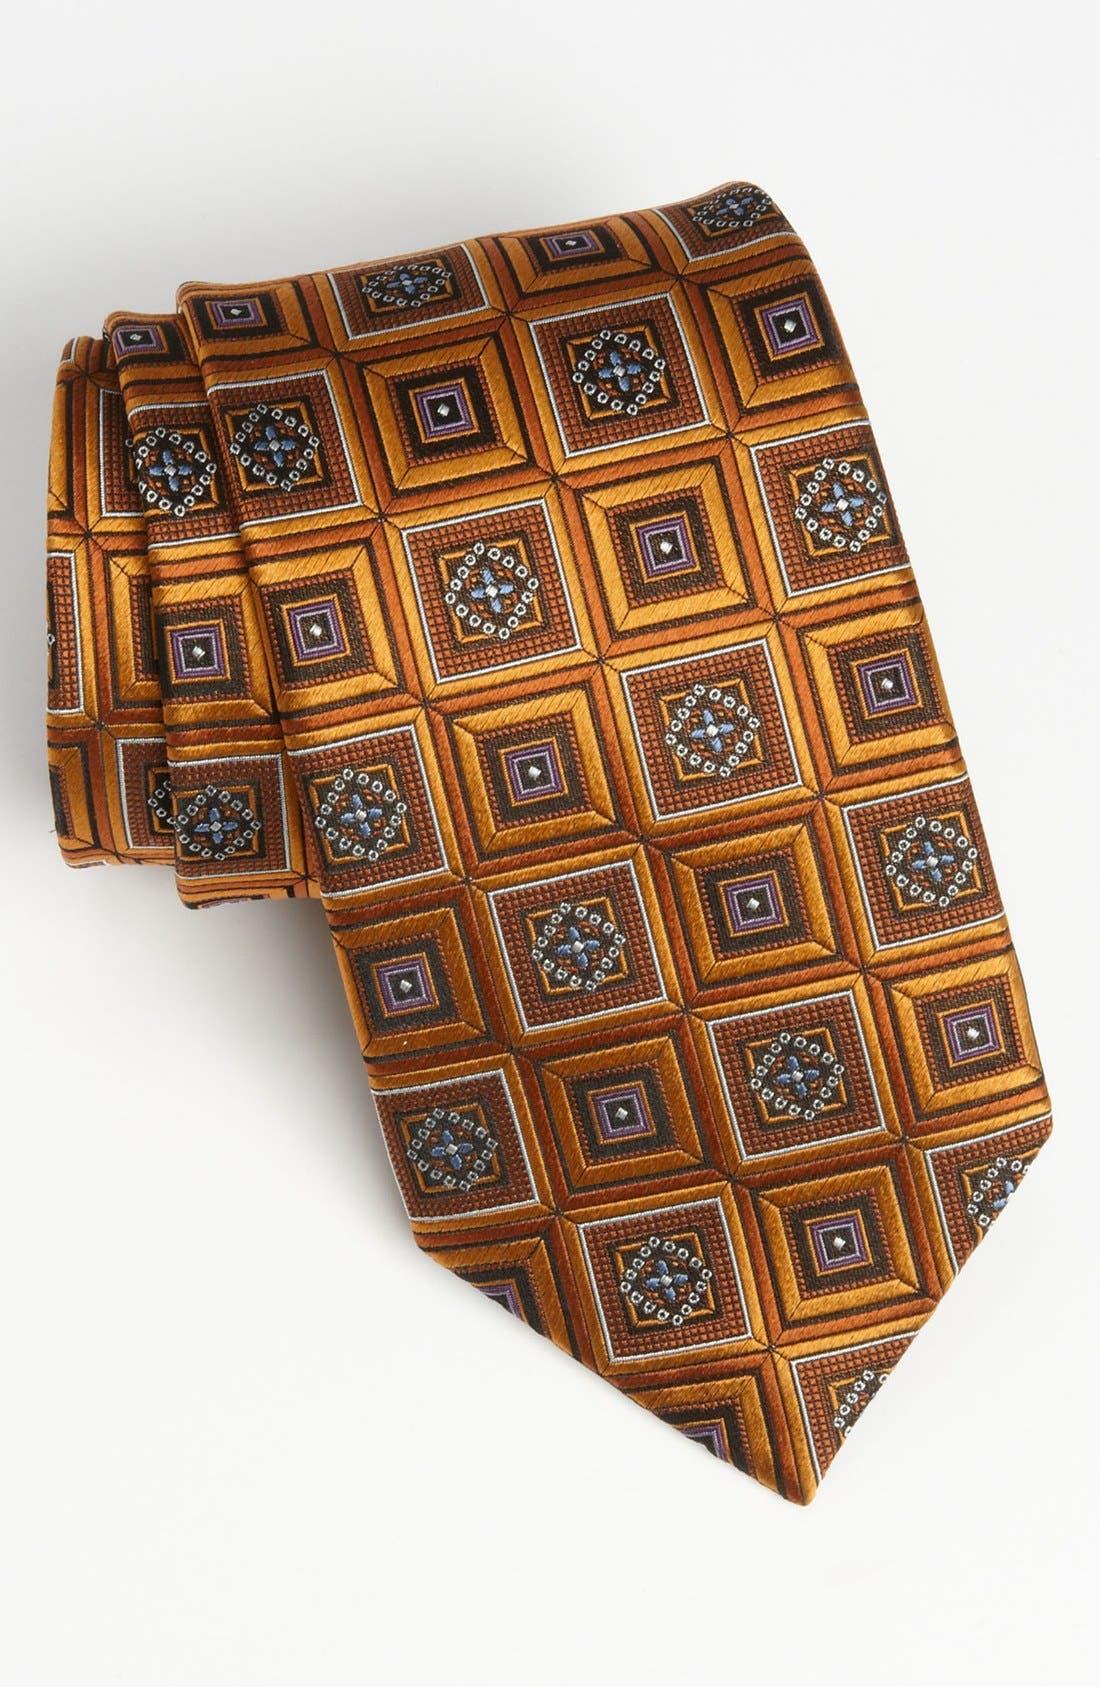 Alternate Image 1 Selected - J.Z. Richards Woven Silk Tie